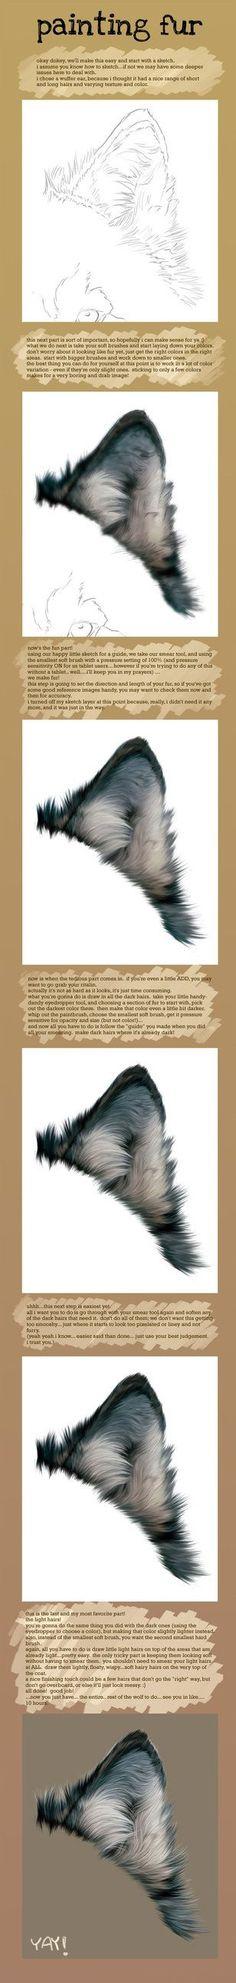 Painting Fur by novawuff [dA] join us http://pinterest.com/koztar/cg-anatomy-tutorials-for-artists/